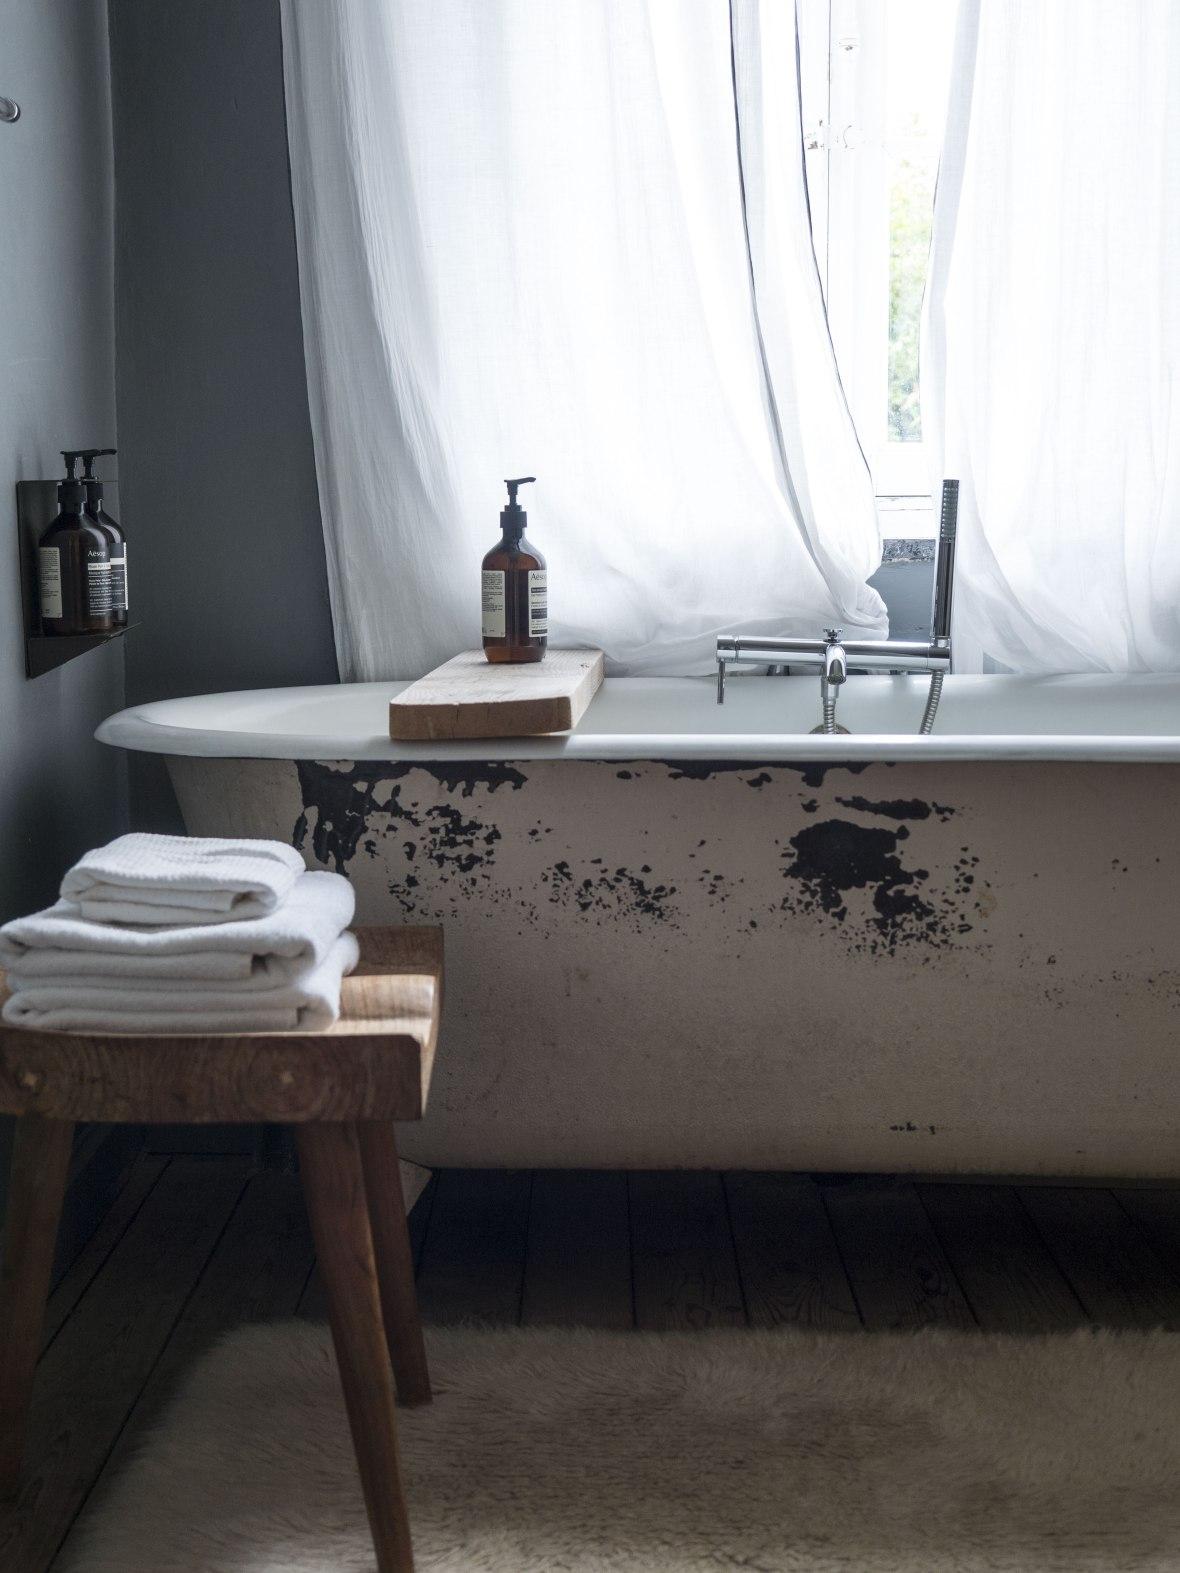 camellas-lloret-montreal-room-4-bathtub.jpg